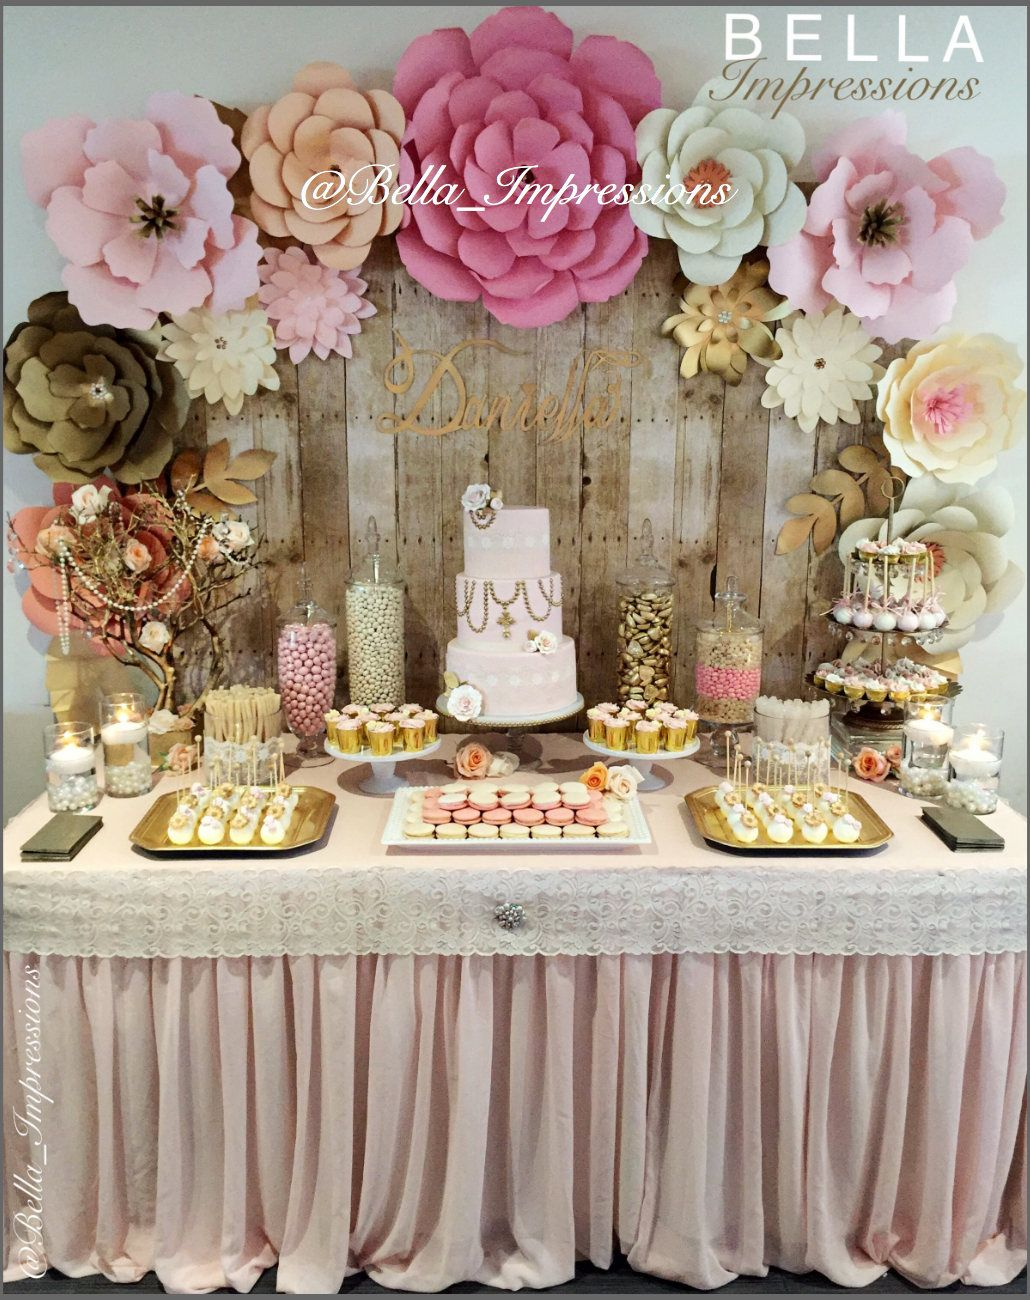 17 Pcs Paper Flower Backdrop All Flowers In Image Dessert